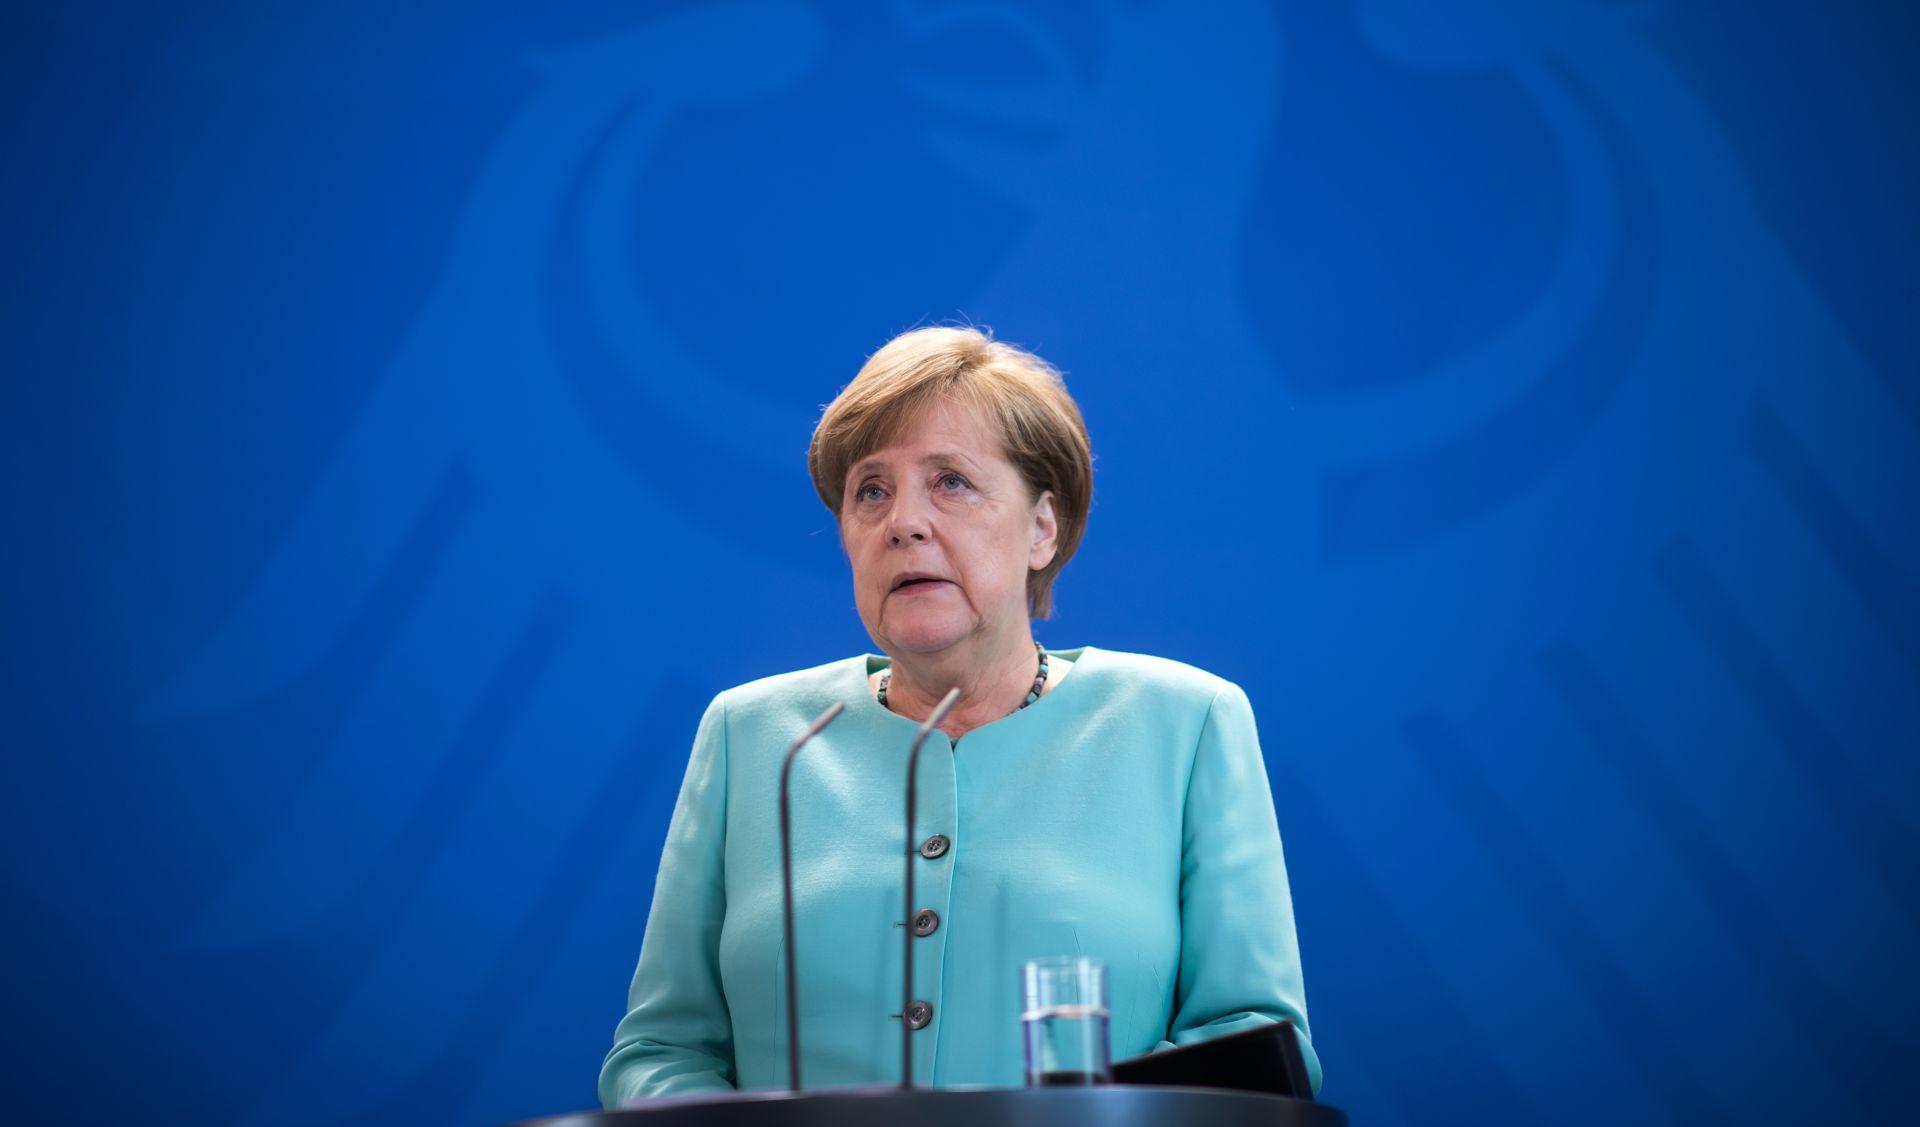 Merkel uoči summita G20 kritizirala Trumpa